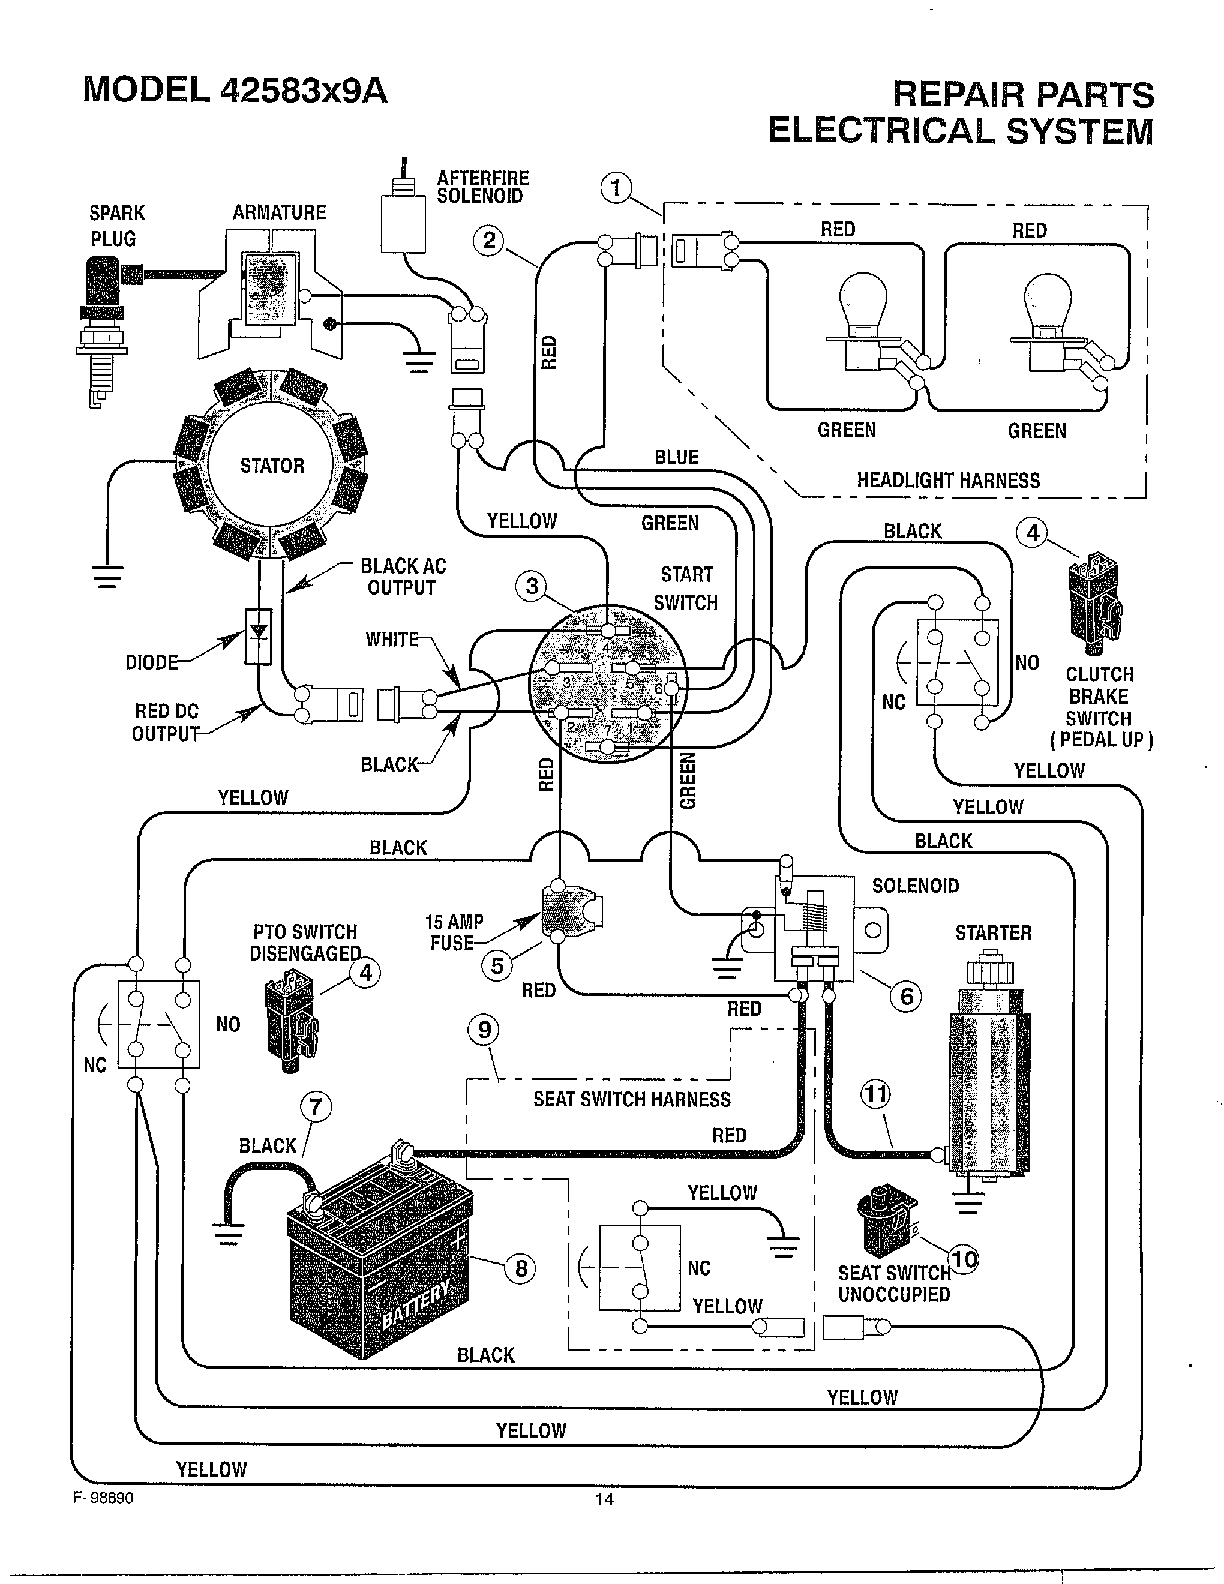 hight resolution of 20 hp briggs and stratton parts diagram wiring 1 1 pluspatrunoua de u202212 hp briggs